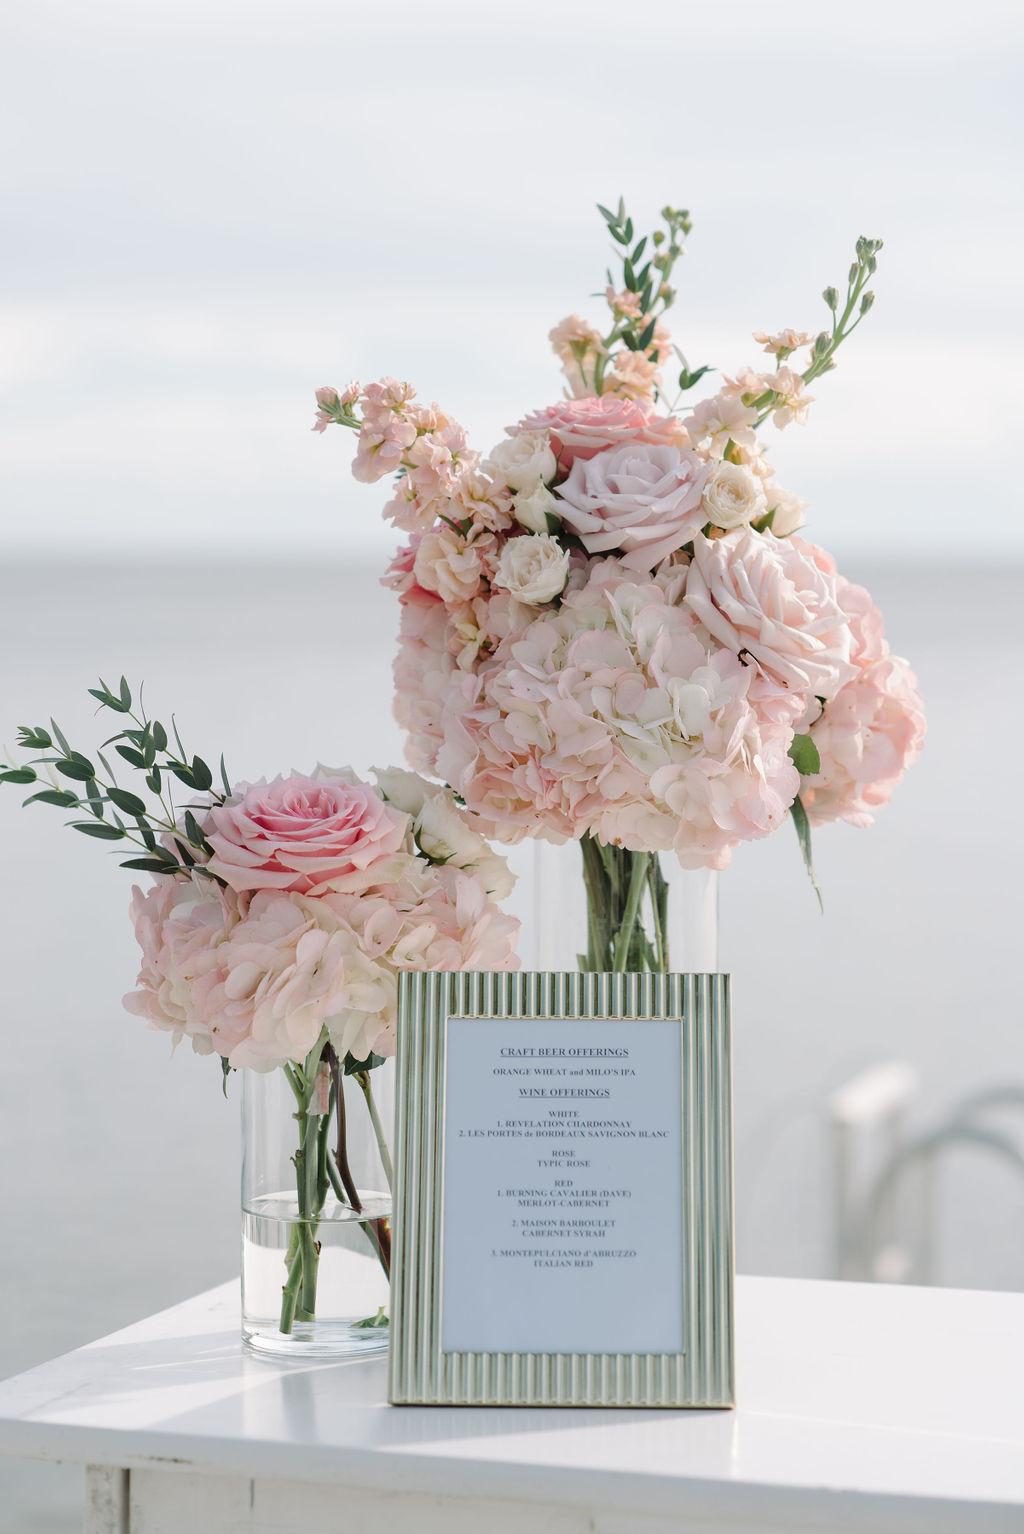 Romantic Wedding Reception Bar Decor, Blush Pink Hydrangeas, Roses and Snapdragon Floral Arrangements | Tampa Bay Wedding Florist Bruce Wayne Florals